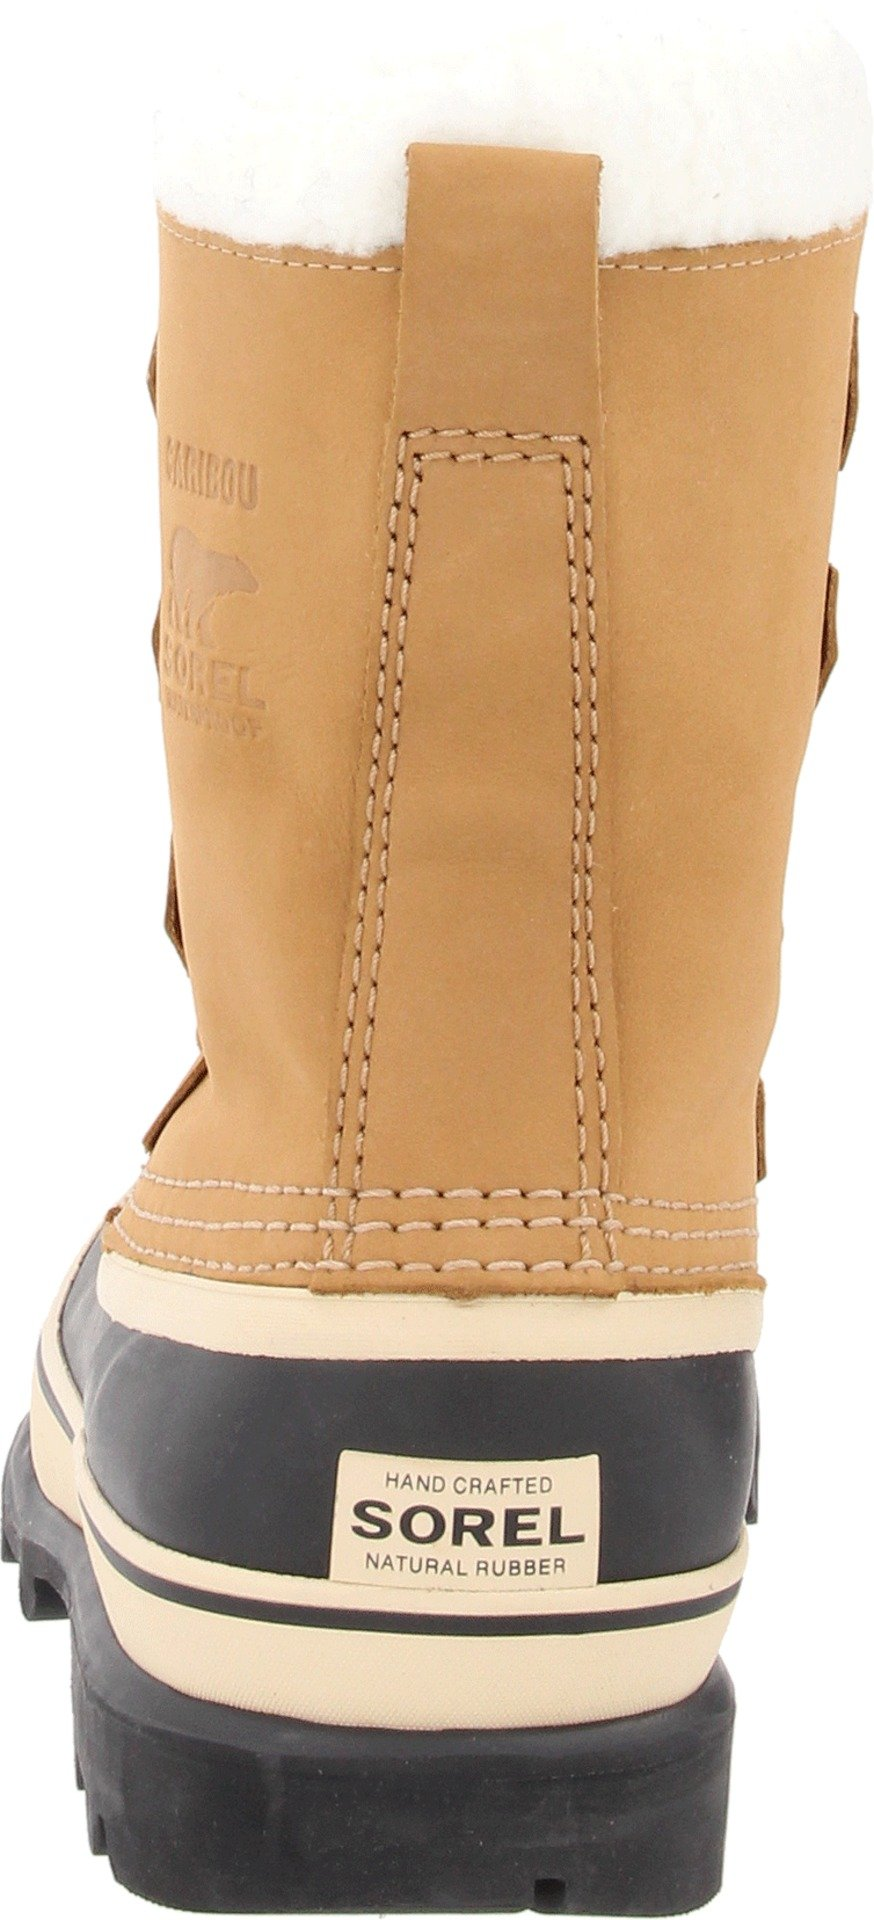 SOREL Women's Caribou NL1005 Boot,Buff,10 M by SOREL (Image #2)